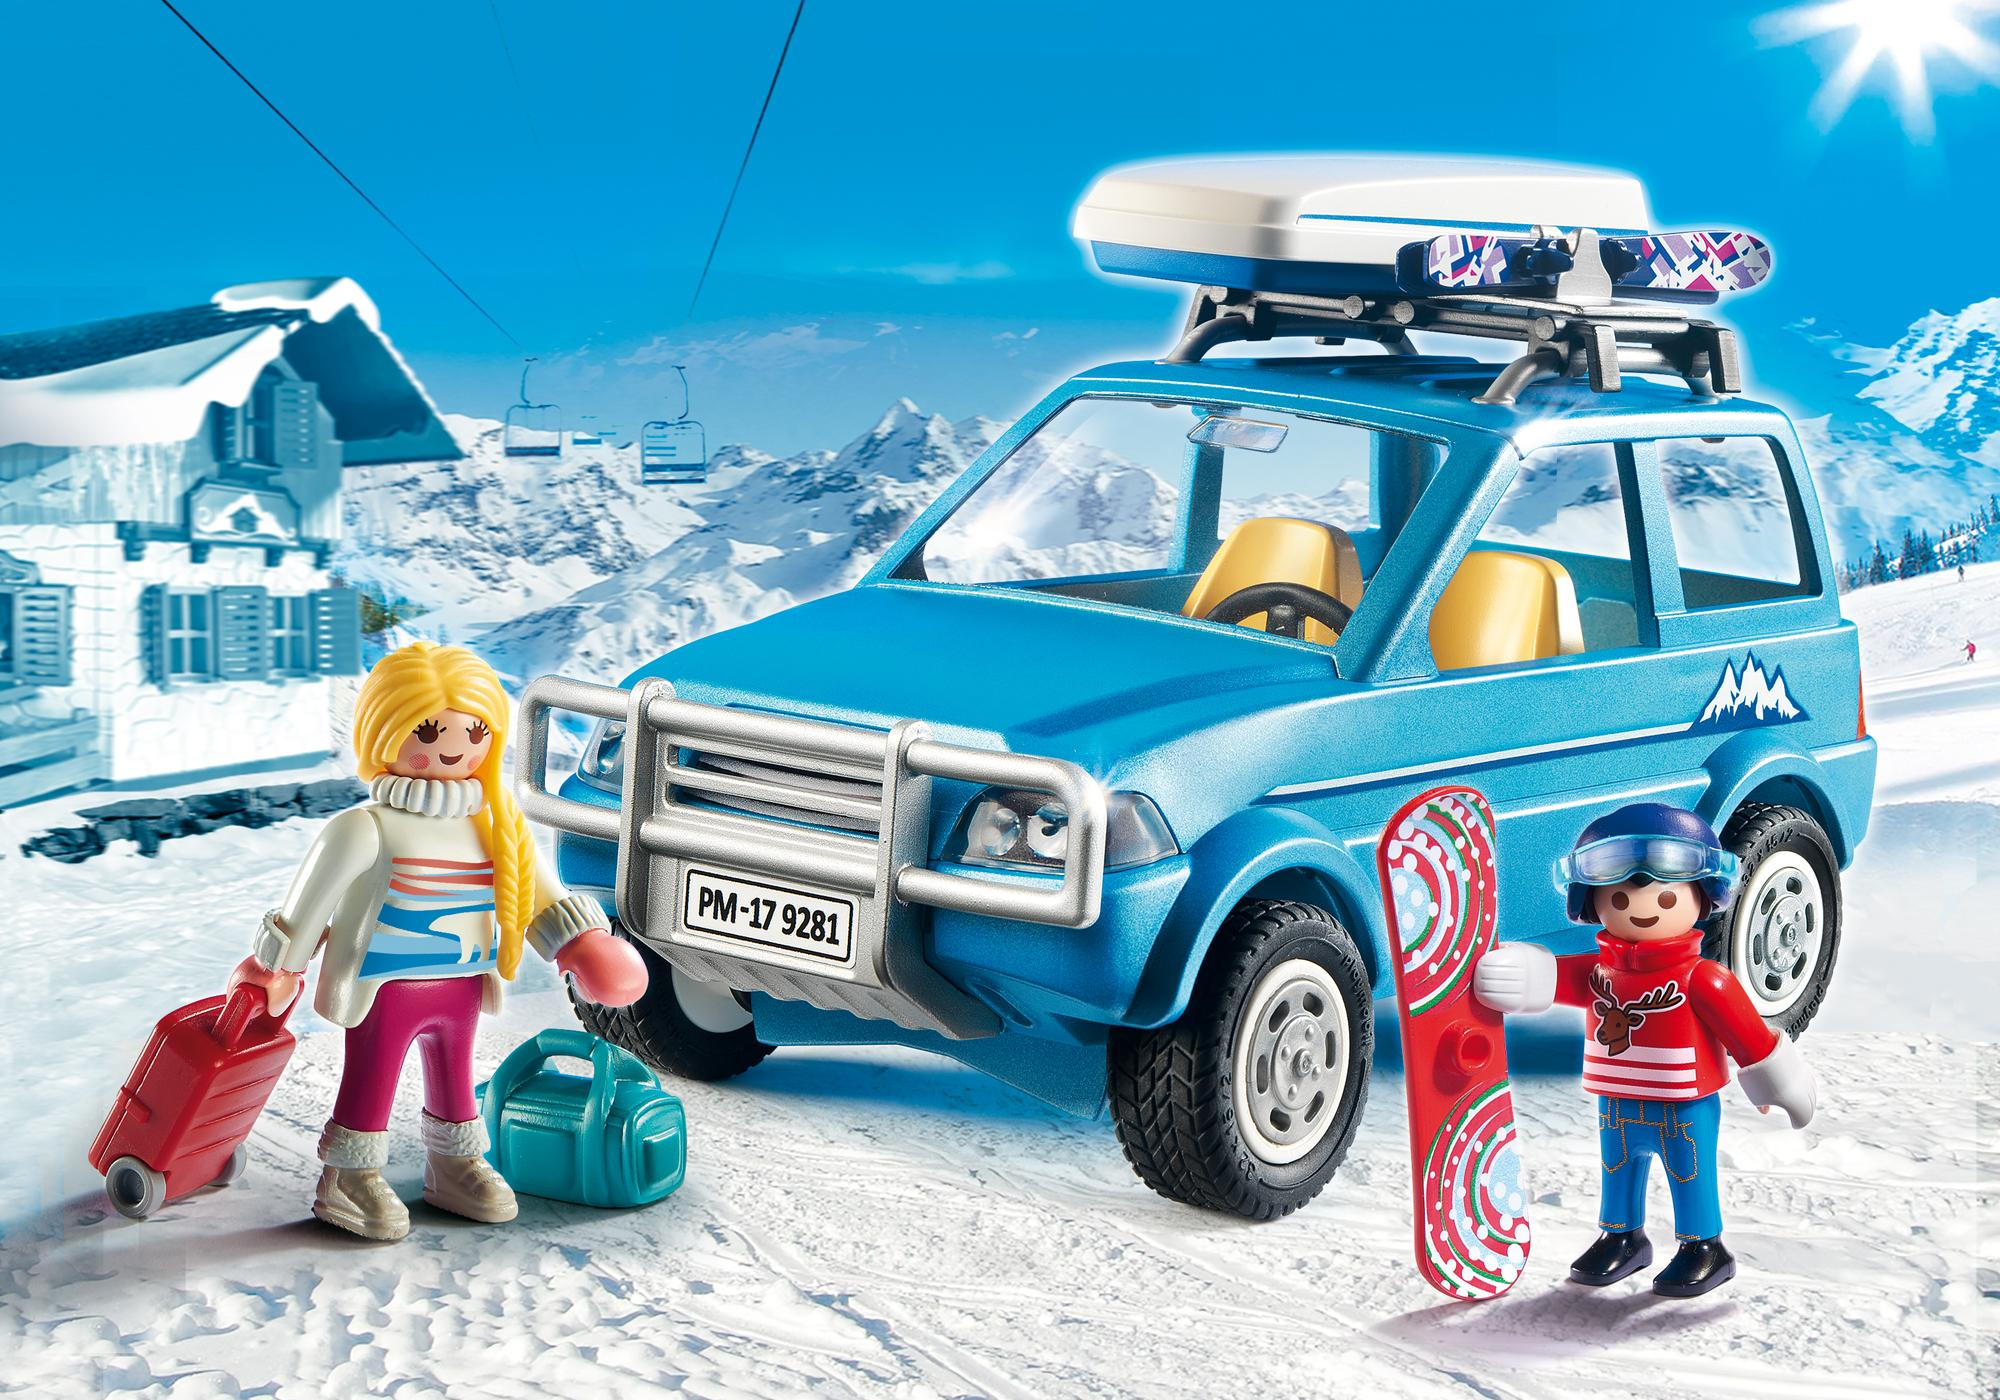 http://media.playmobil.com/i/playmobil/9281_product_detail/4x4 met dakkoffer